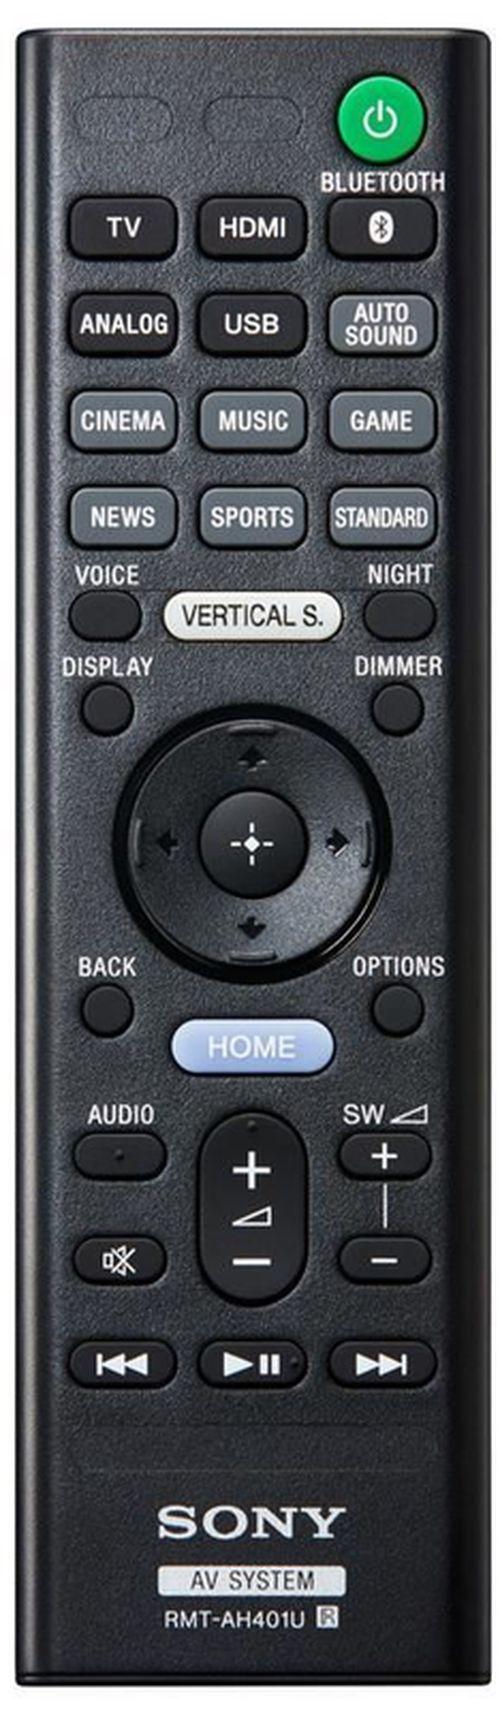 купить Саундбар Sony HTXF9000 в Кишинёве